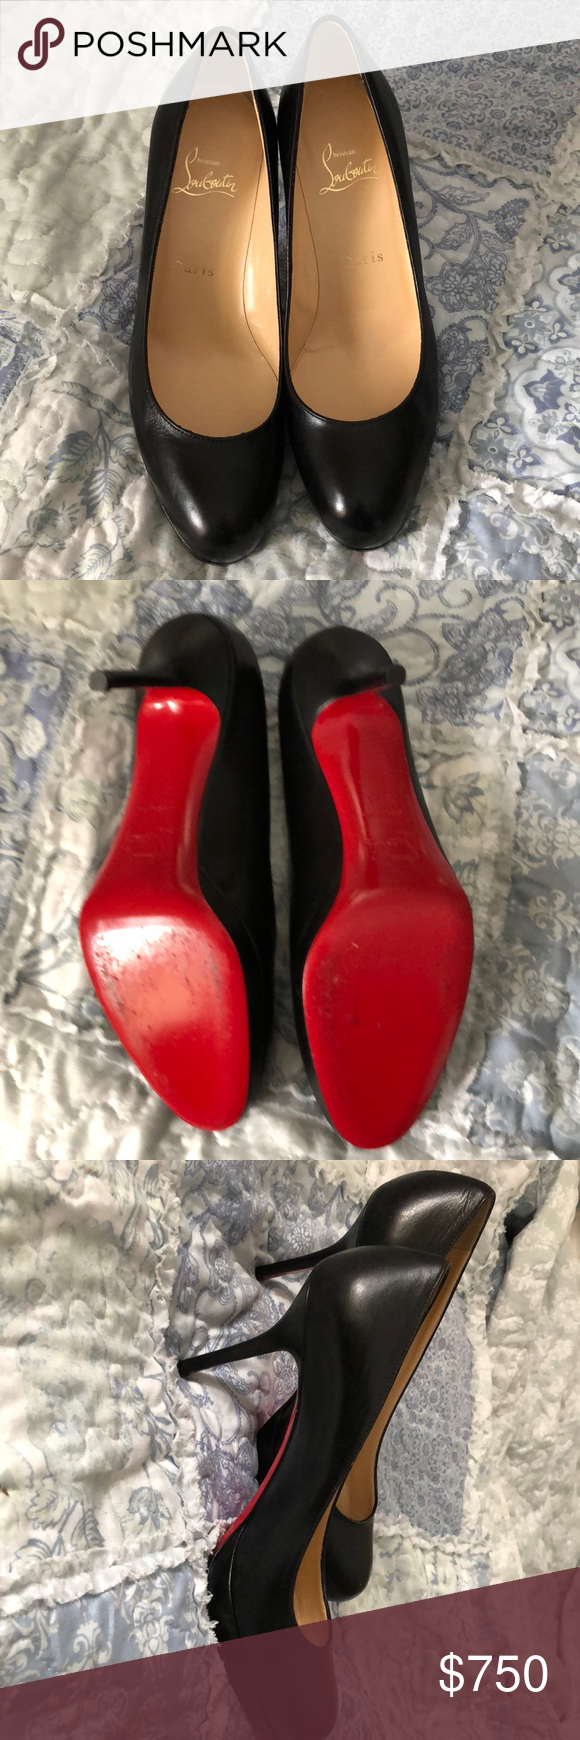 inch heel Christian Louboutin worn once